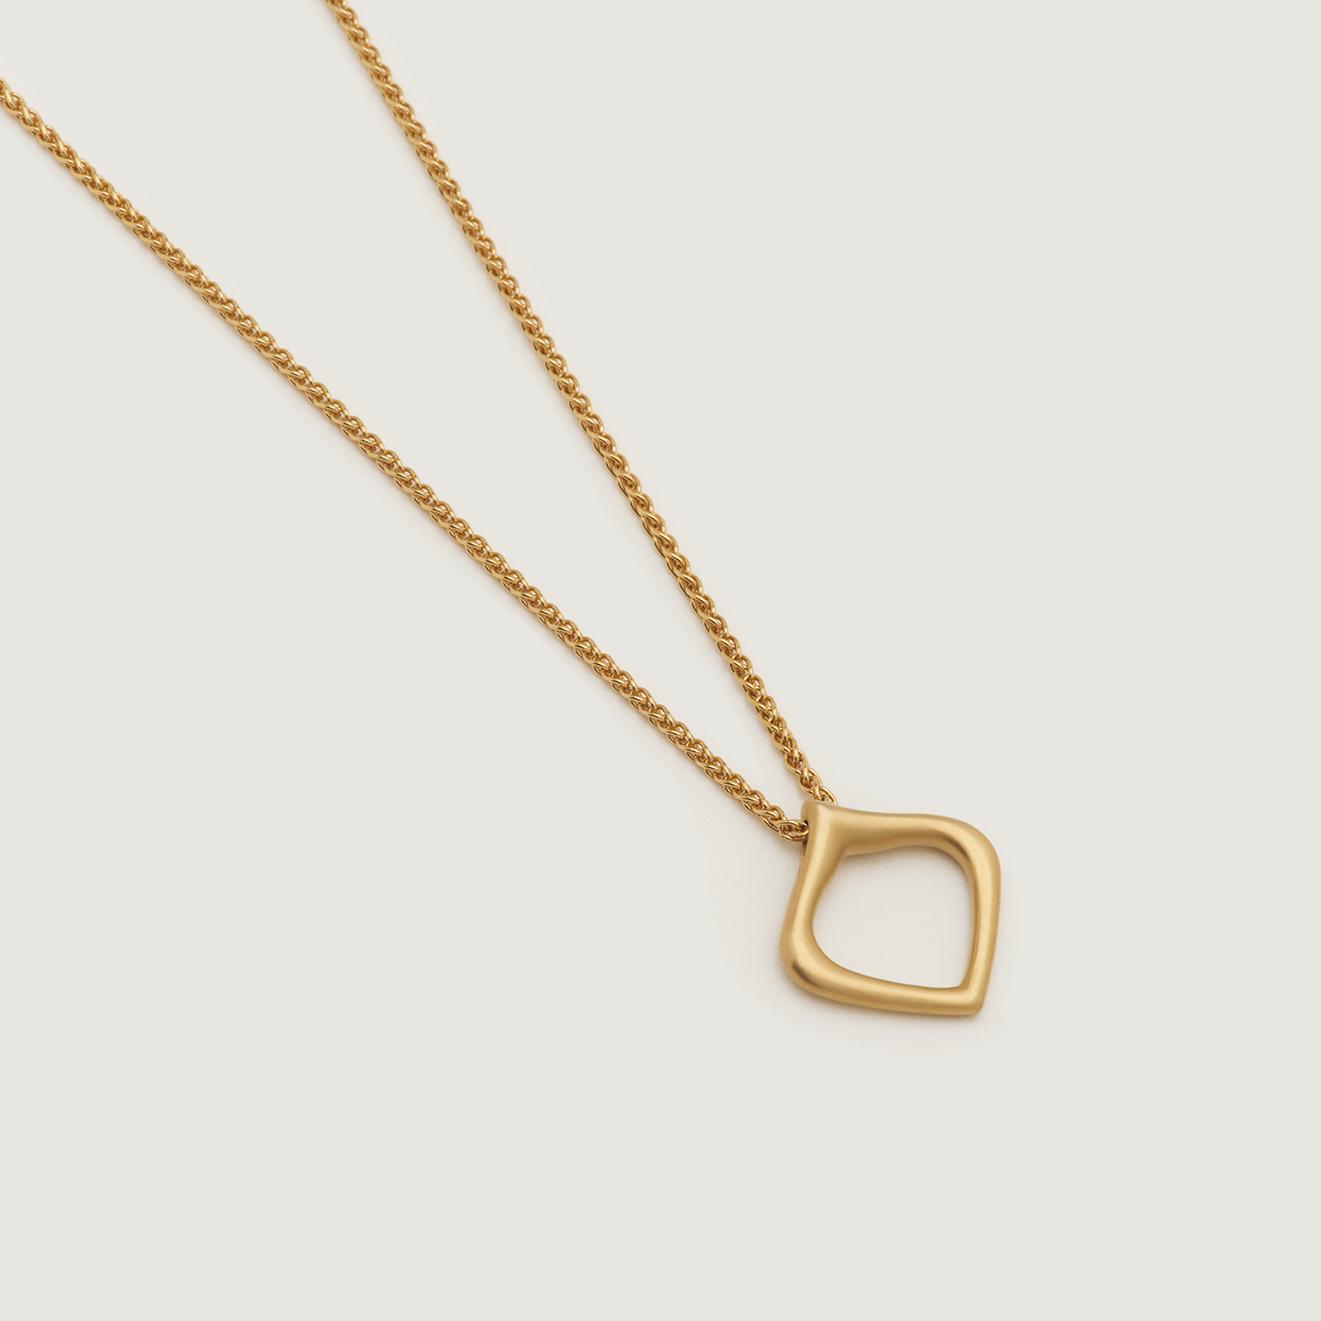 Moznabi Jewellery – Essence of Persia – Gold Pendant